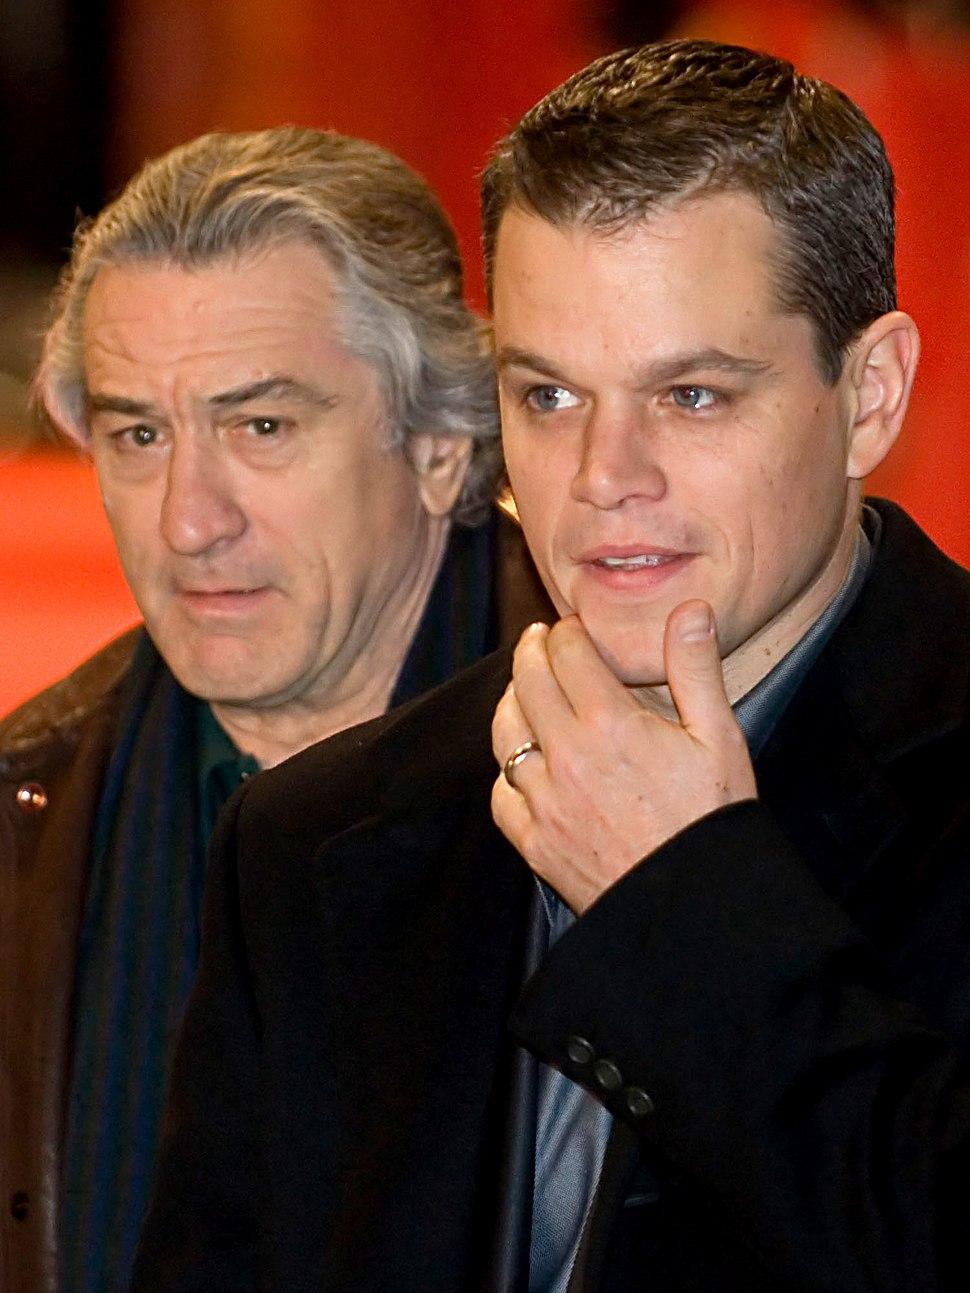 Photo of Damon and De Niro, each wearing a tuxedo jacket and a dark blue shirt.